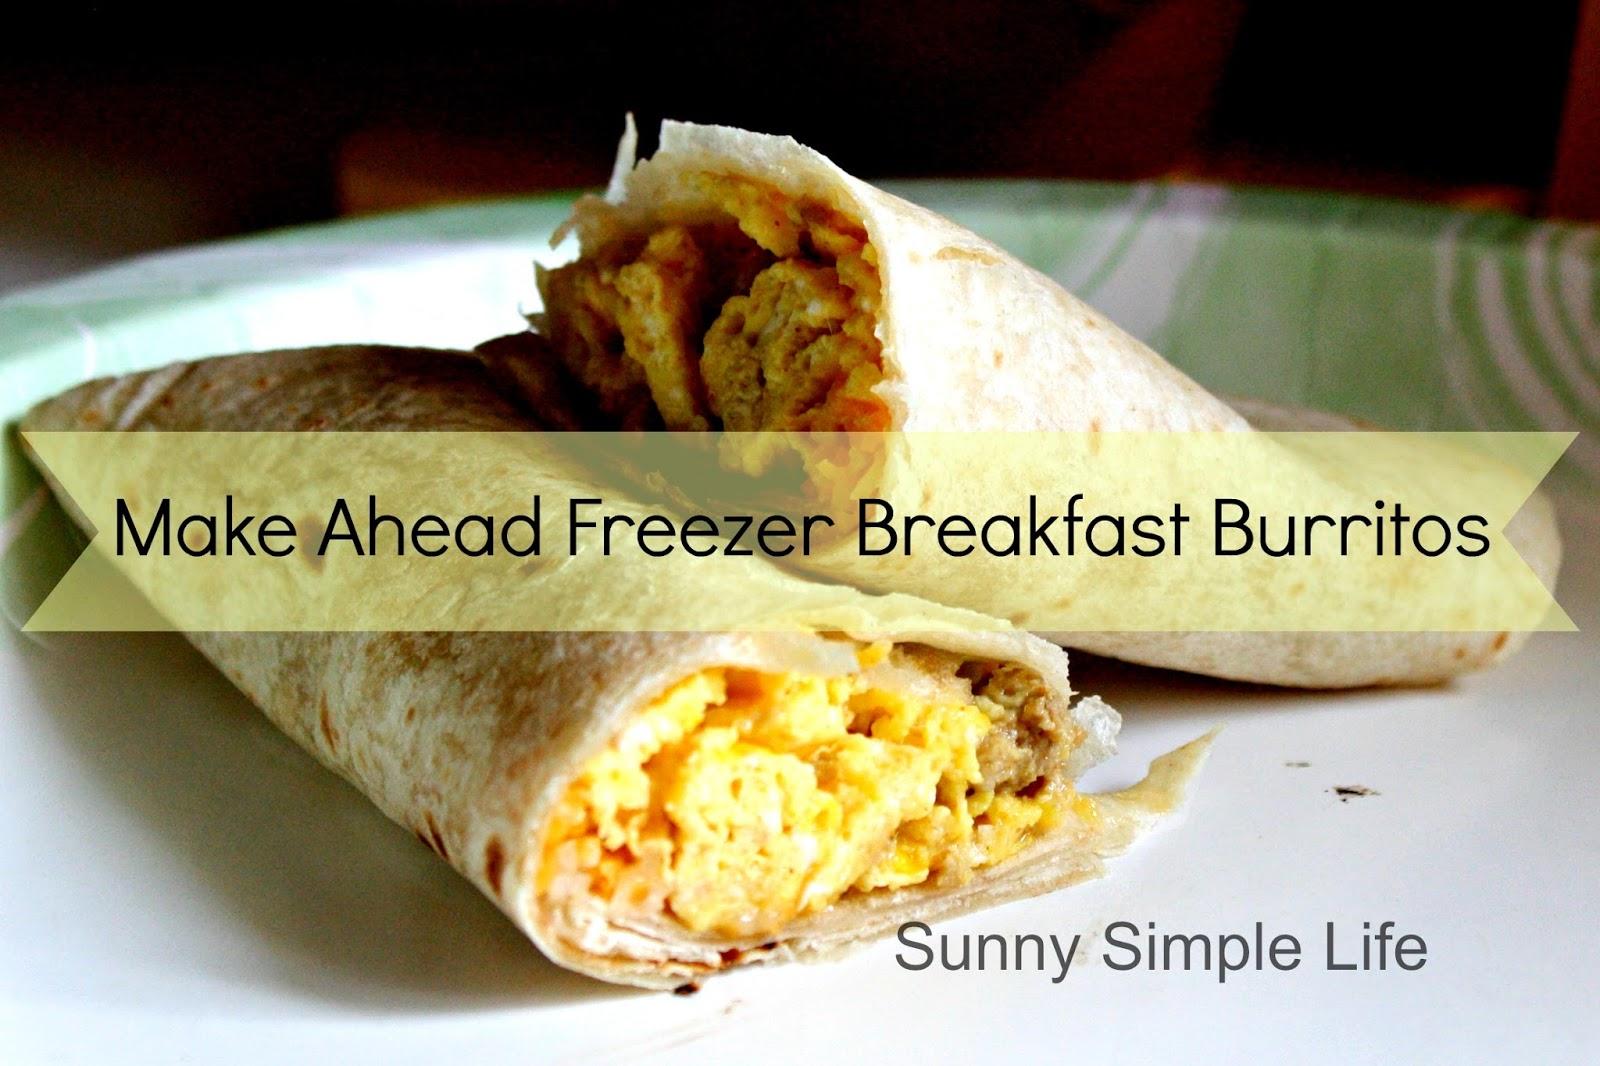 sunny simple life  make ahead freezer breakfast burritos